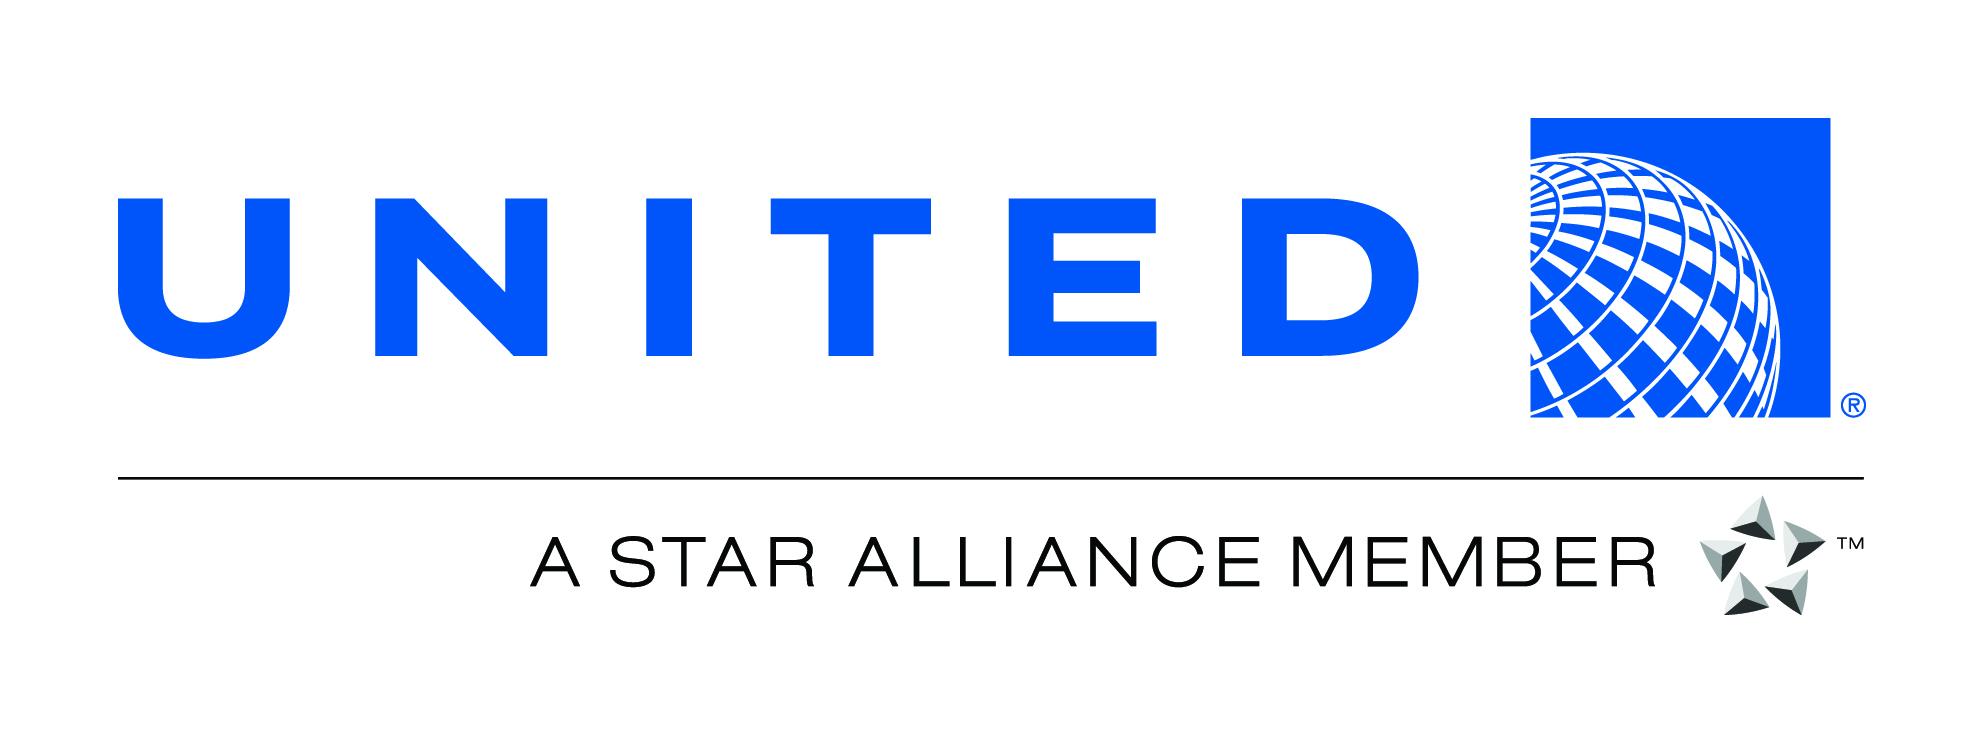 https://cdn.kscope.io/e61879bac283bde86955b35d00adf437-unitedstaralliance_logo.jpg